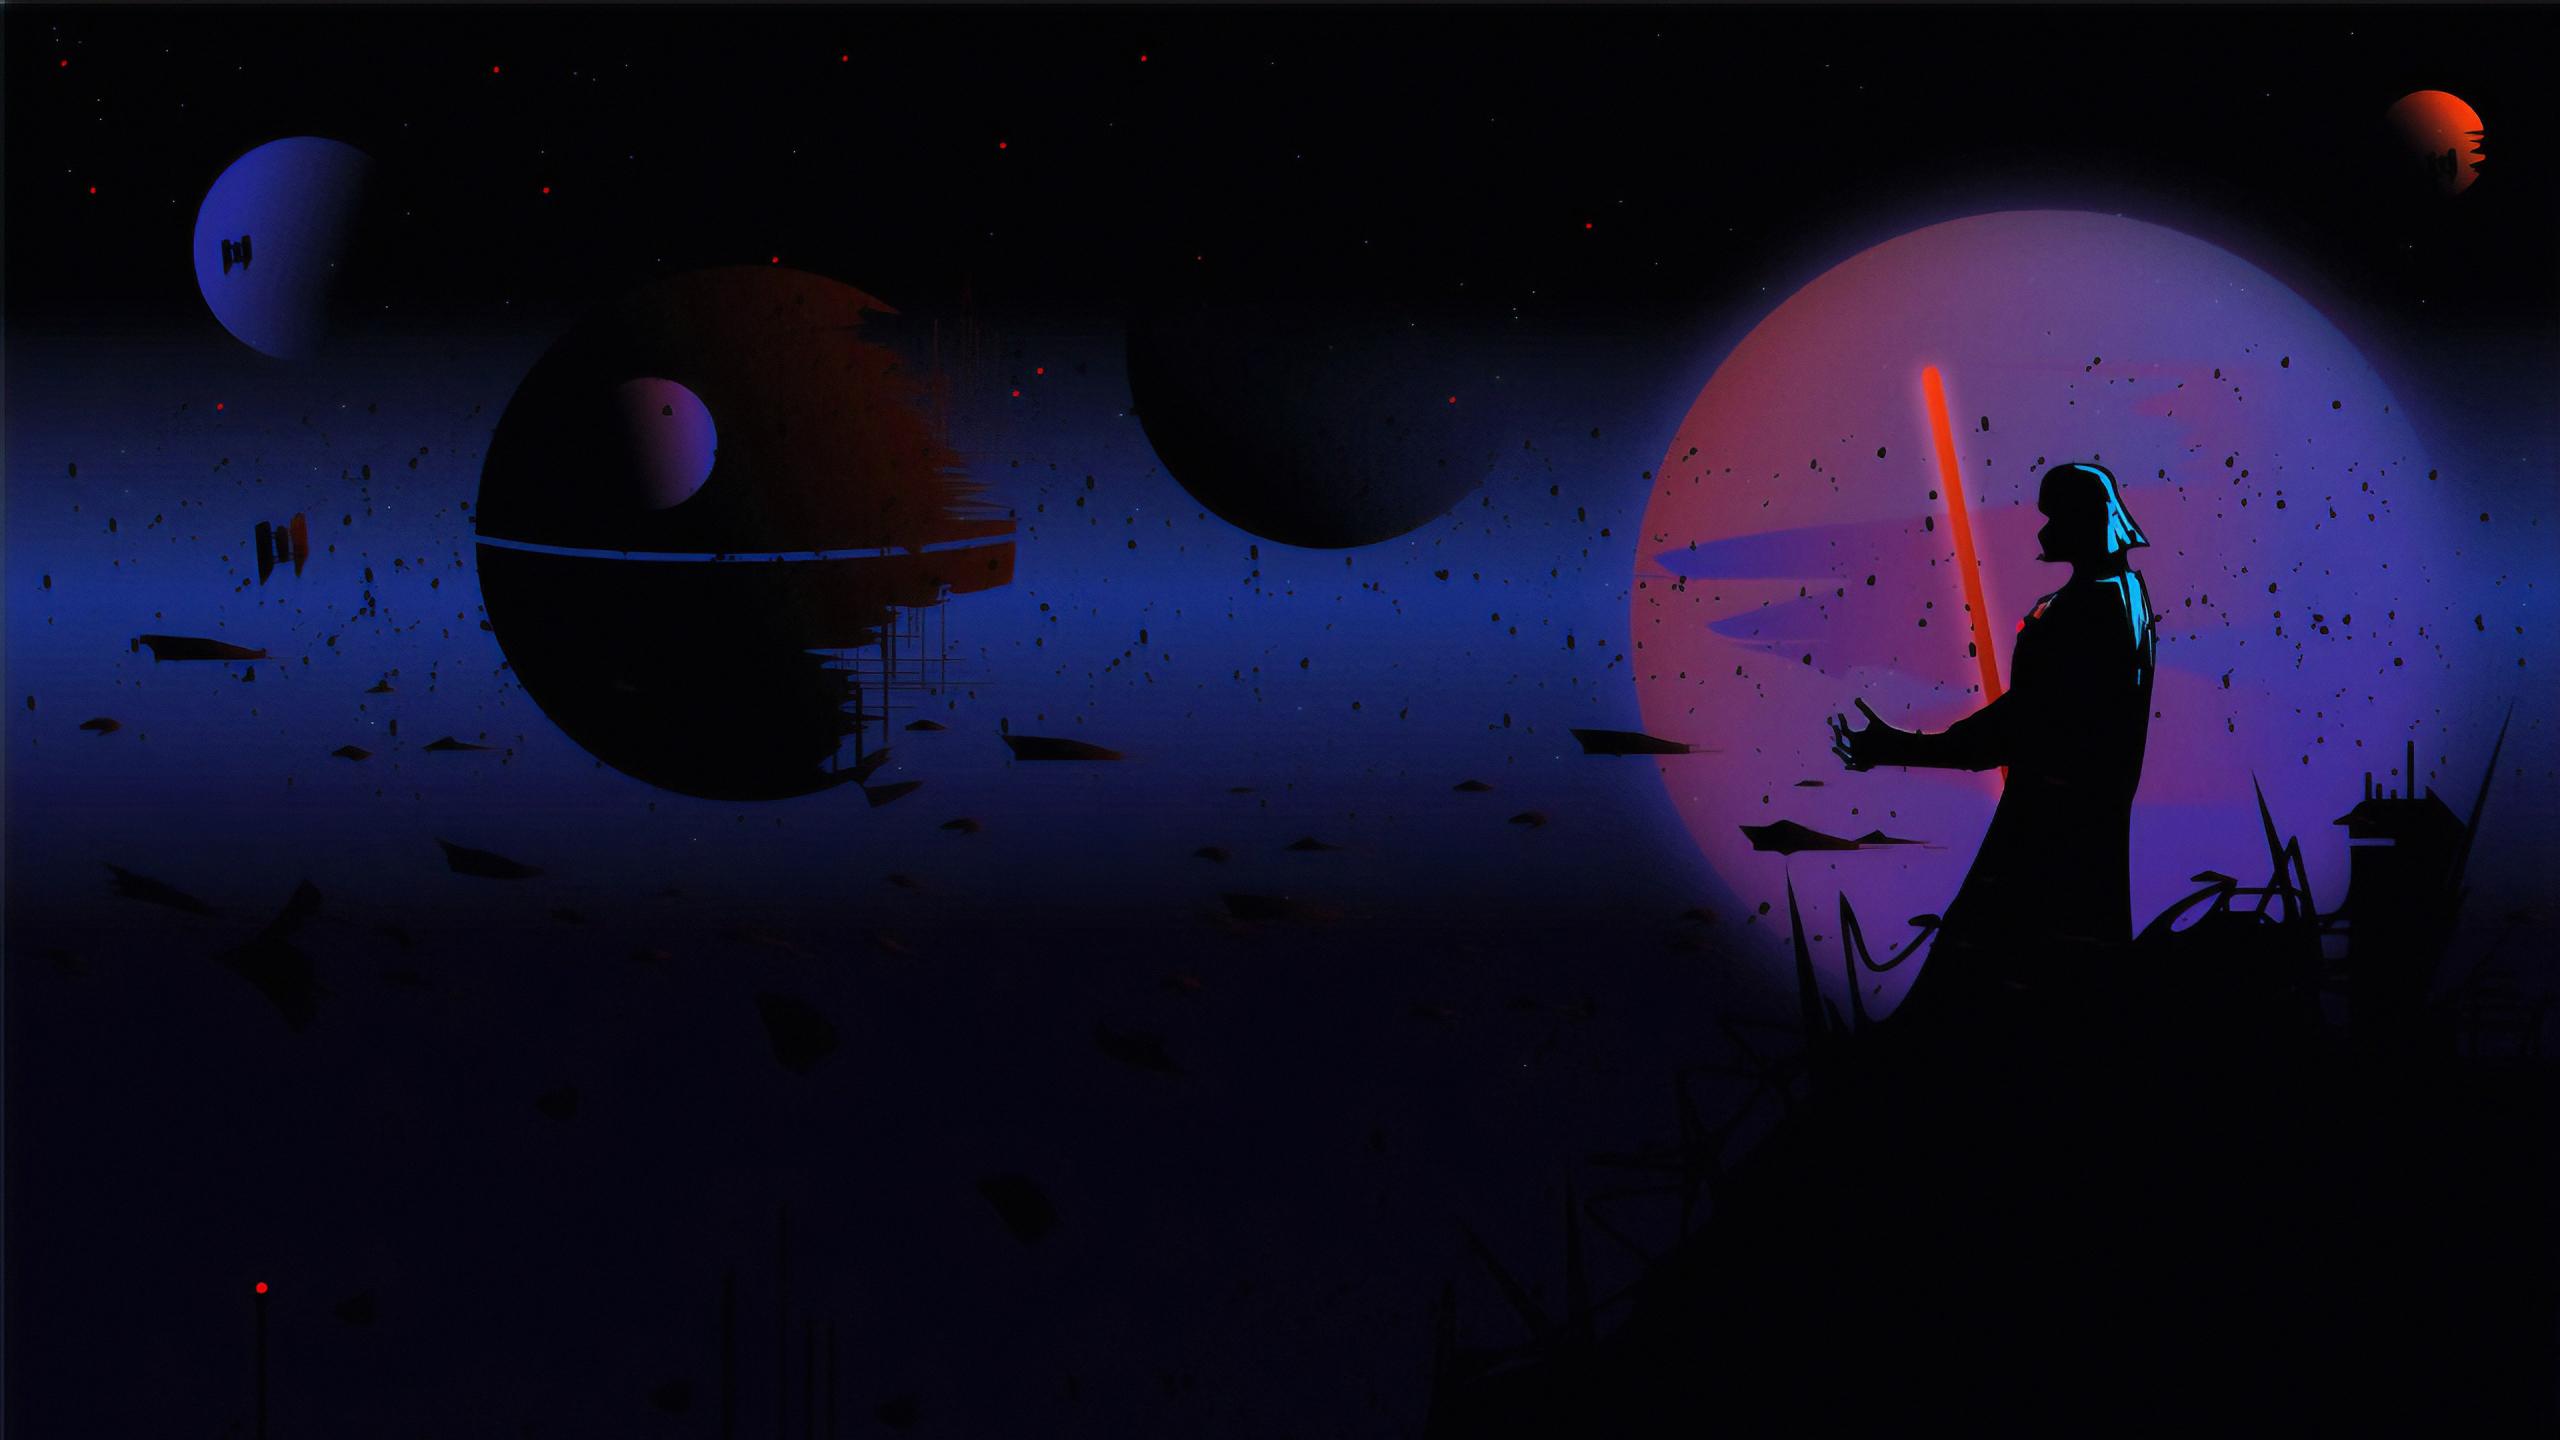 Darth Vader Wallpaper 4k , HD Wallpaper & Backgrounds